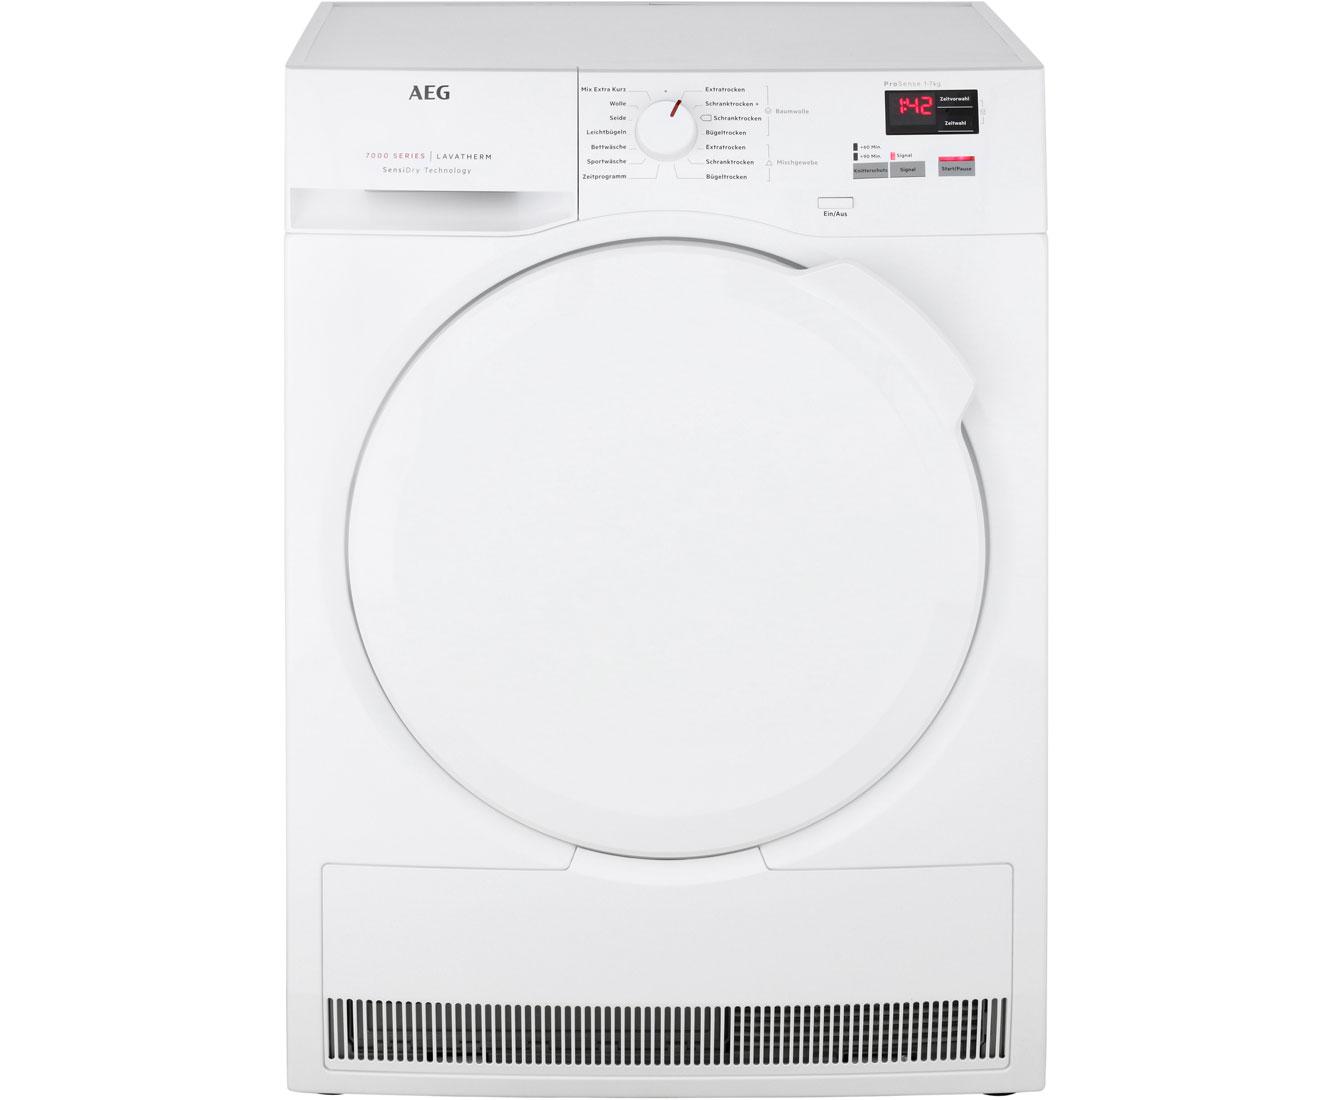 AEG Lavatherm T7DBA2 Wärmepumpentrockner - Weiß | Bad > Waschmaschinen und Trockner > Wärmepumpentrockner | Weiß | AEG